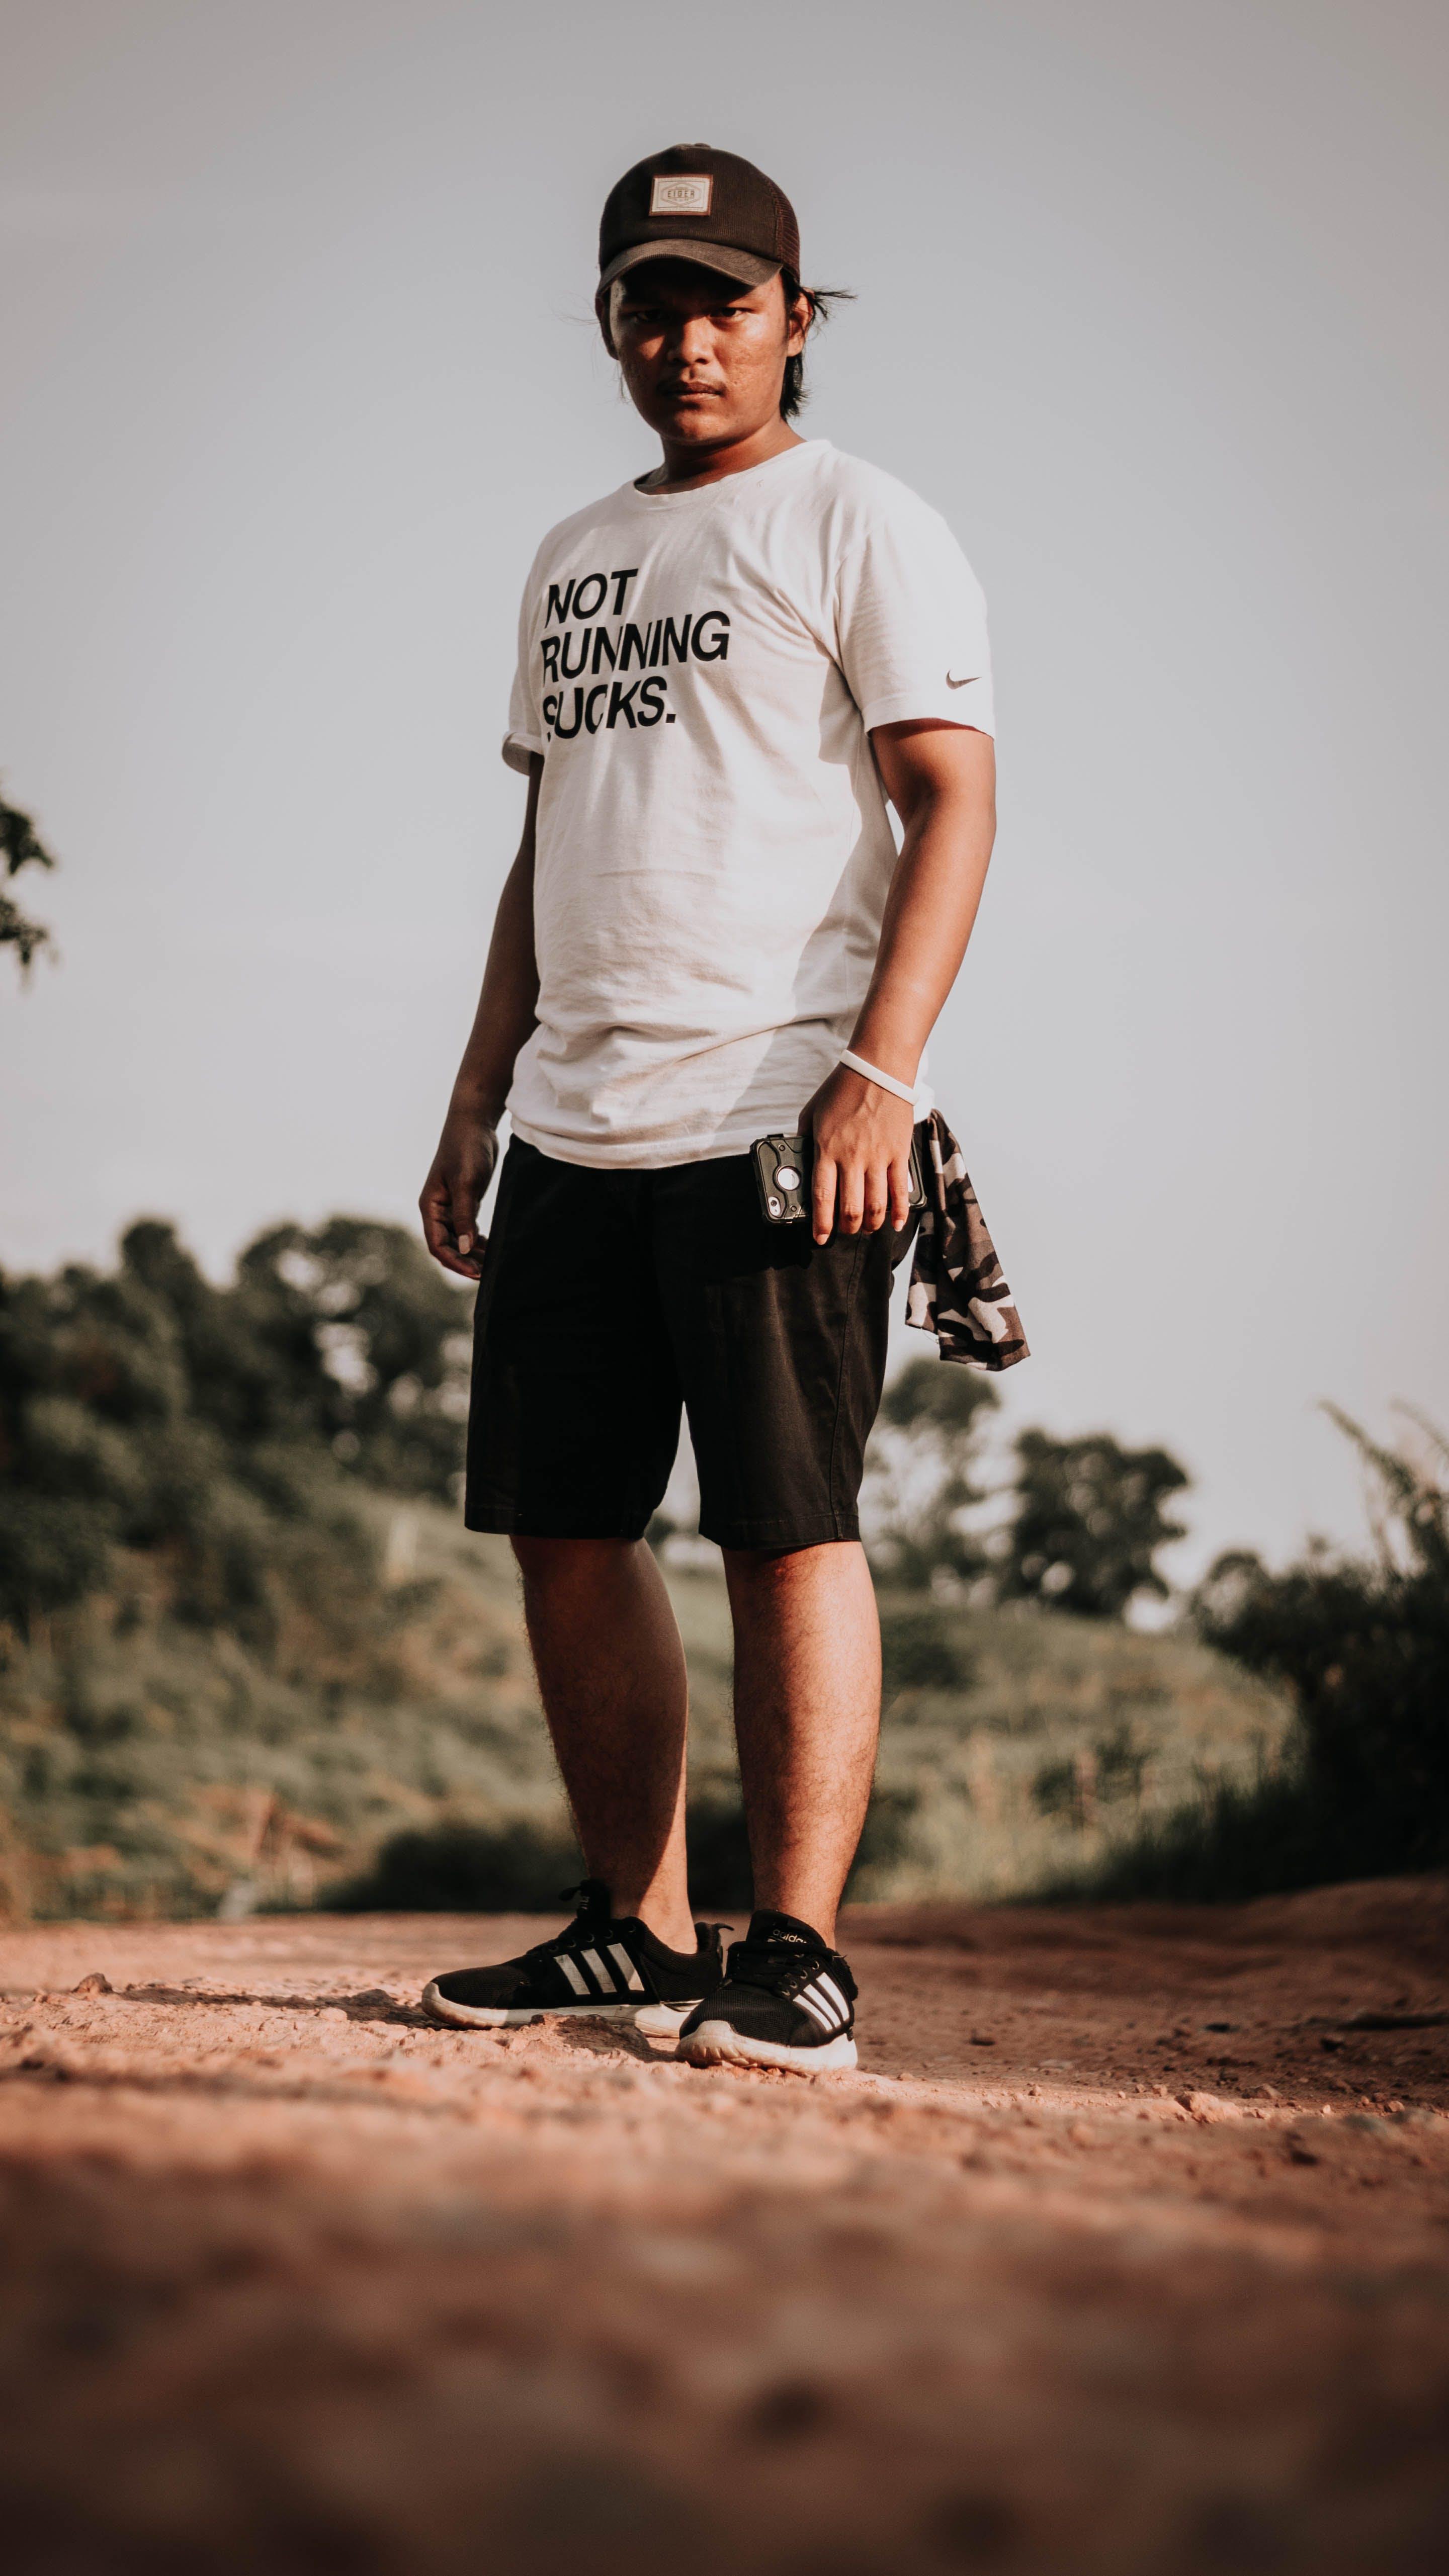 Man Standing on Pathway